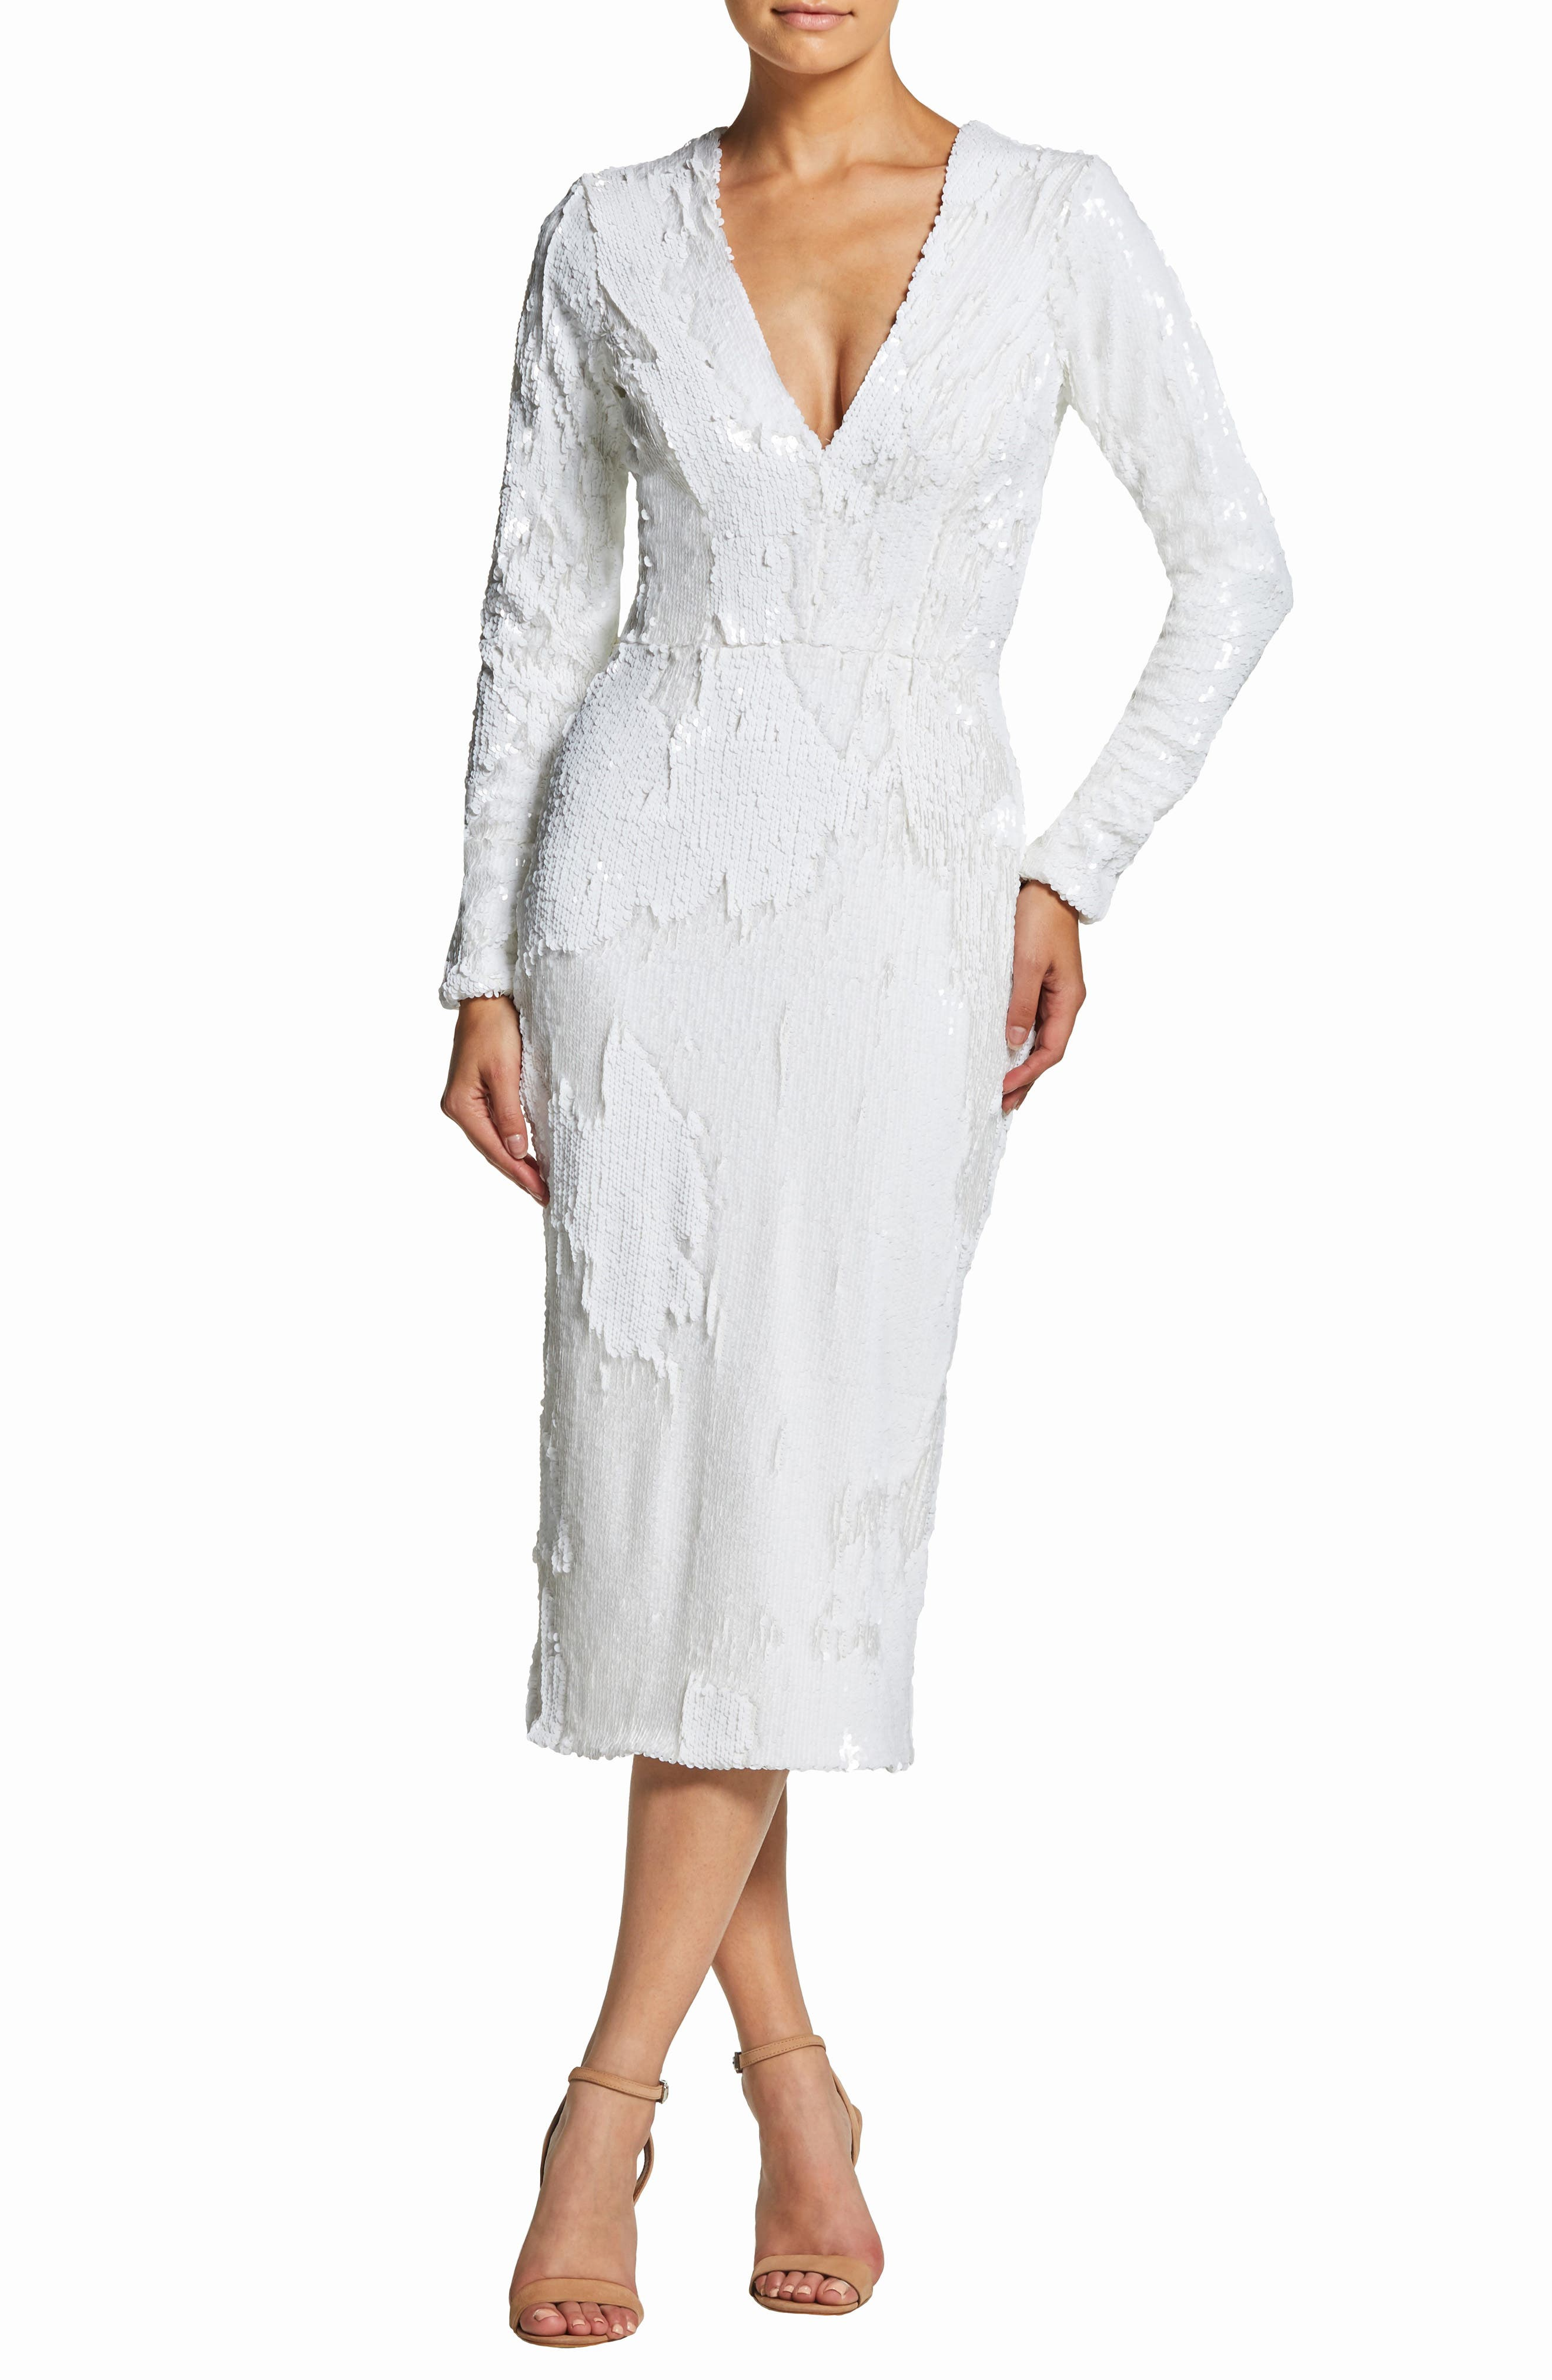 DRESS THE POPULATION Elizabeth Plunge Midi Dress, Main, color, LILY